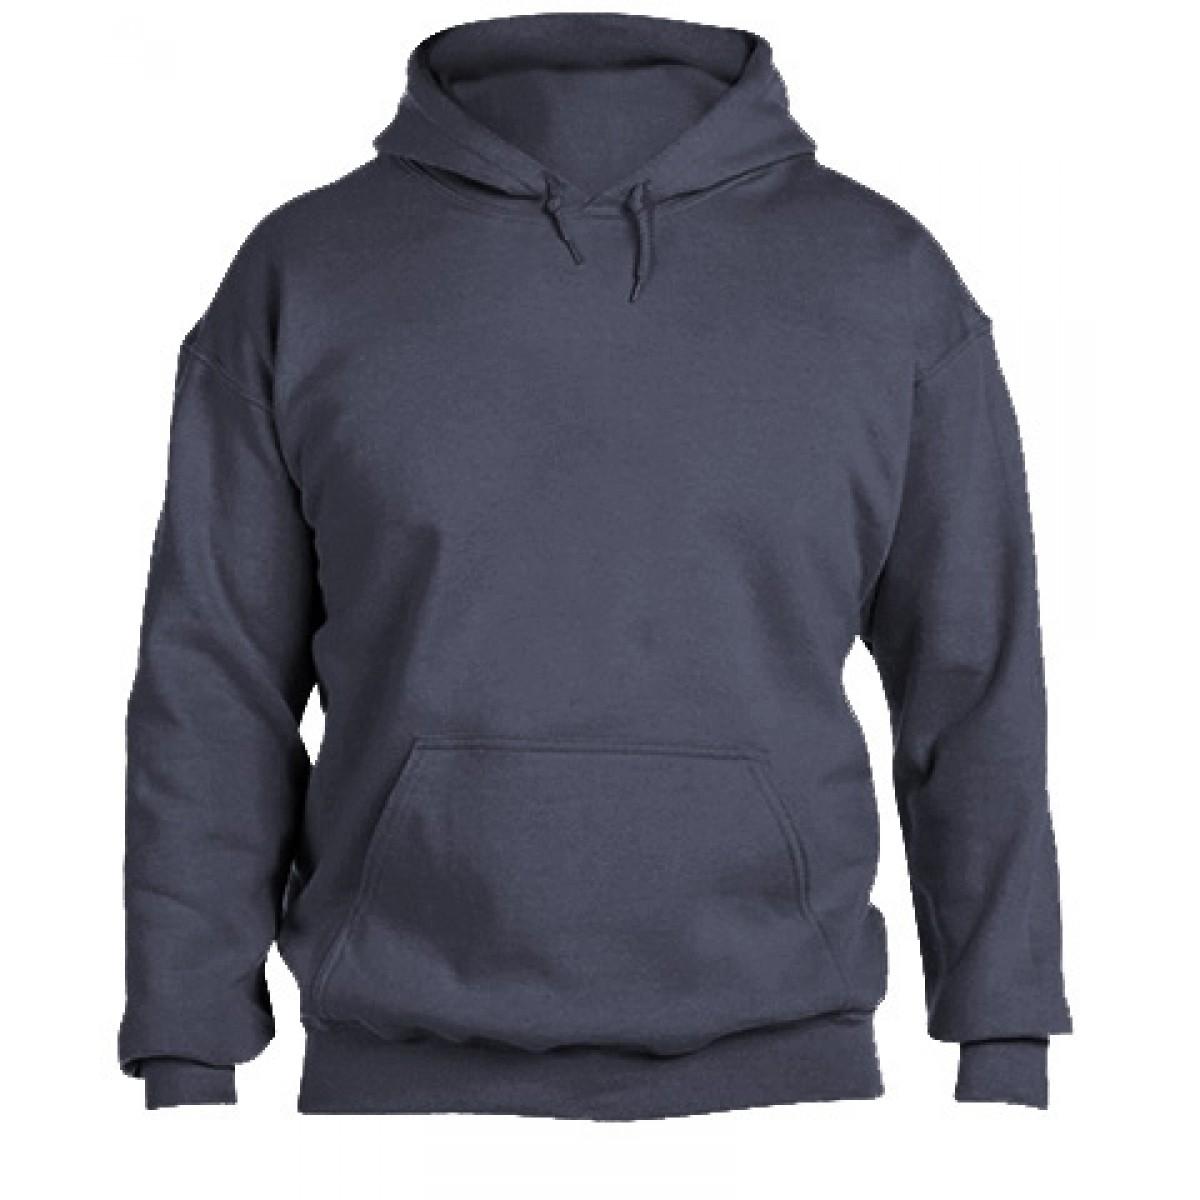 Solid Hooded Sweatshirt  50/50 Heavy Blend-Heather Navy-YS